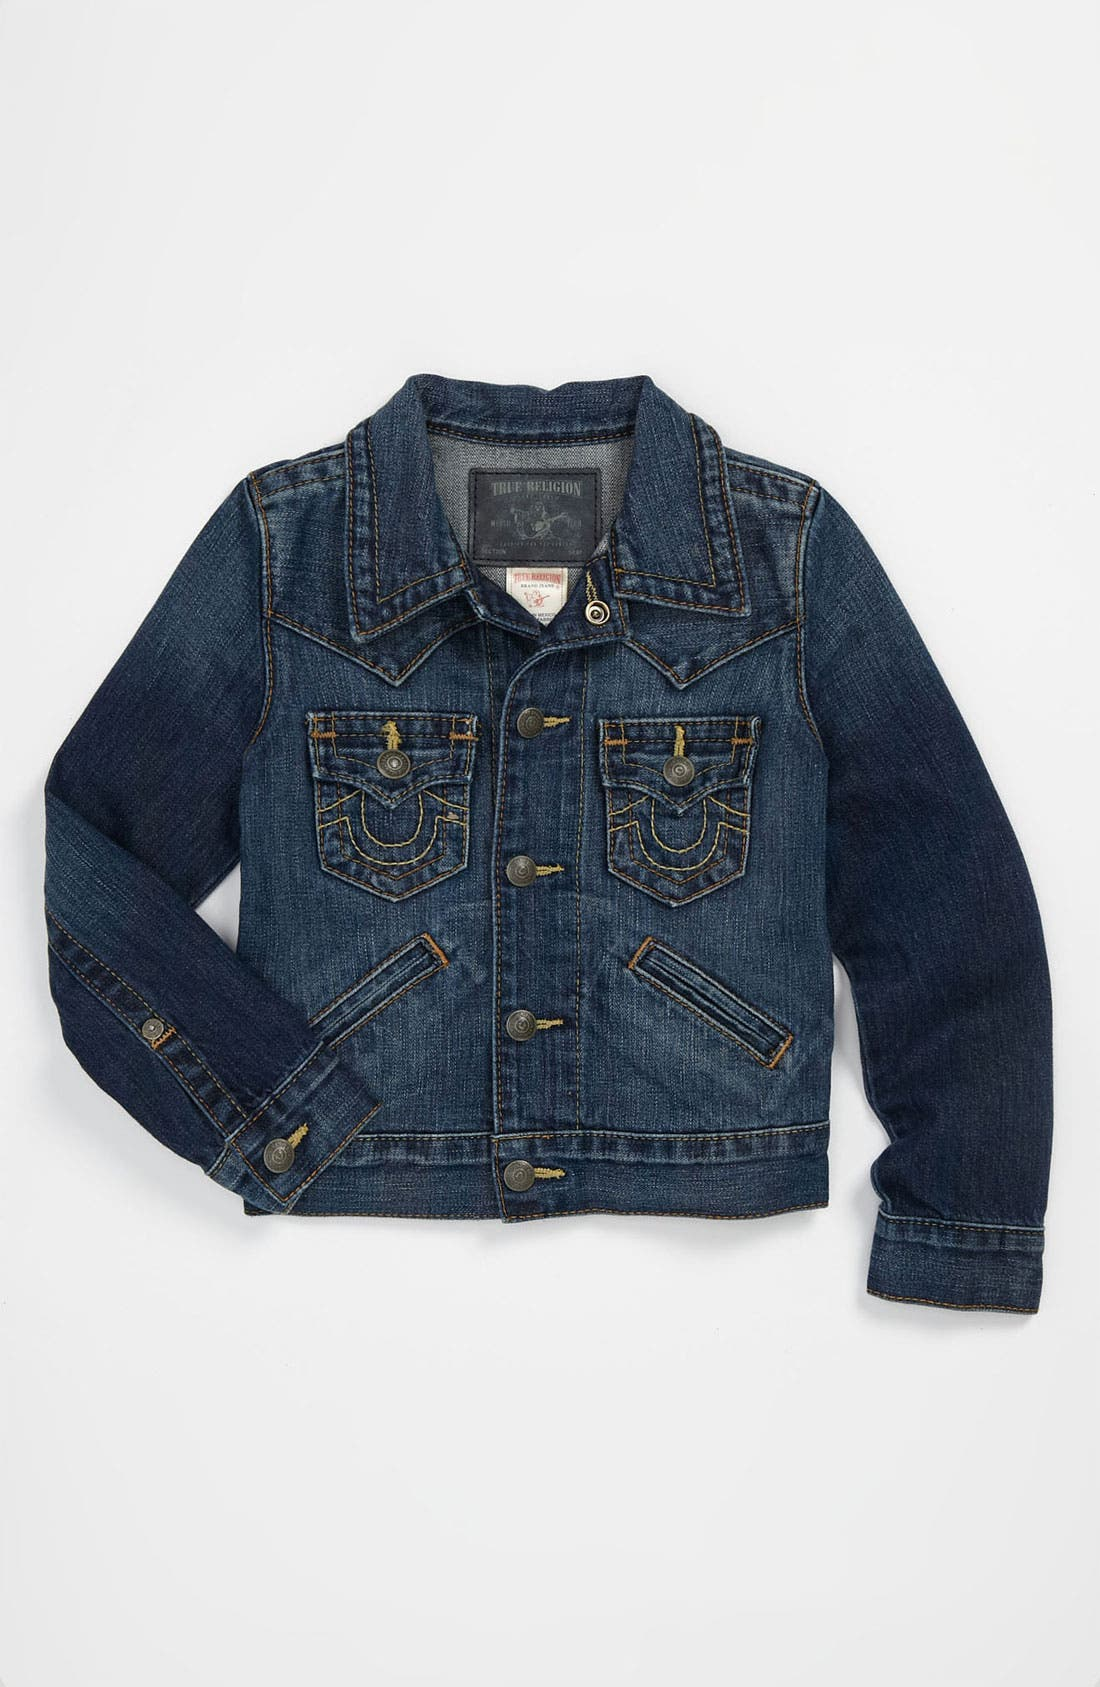 Alternate Image 1 Selected - True Religion Brand Jeans 'Johnny' Denim Jacket (Little Boys)